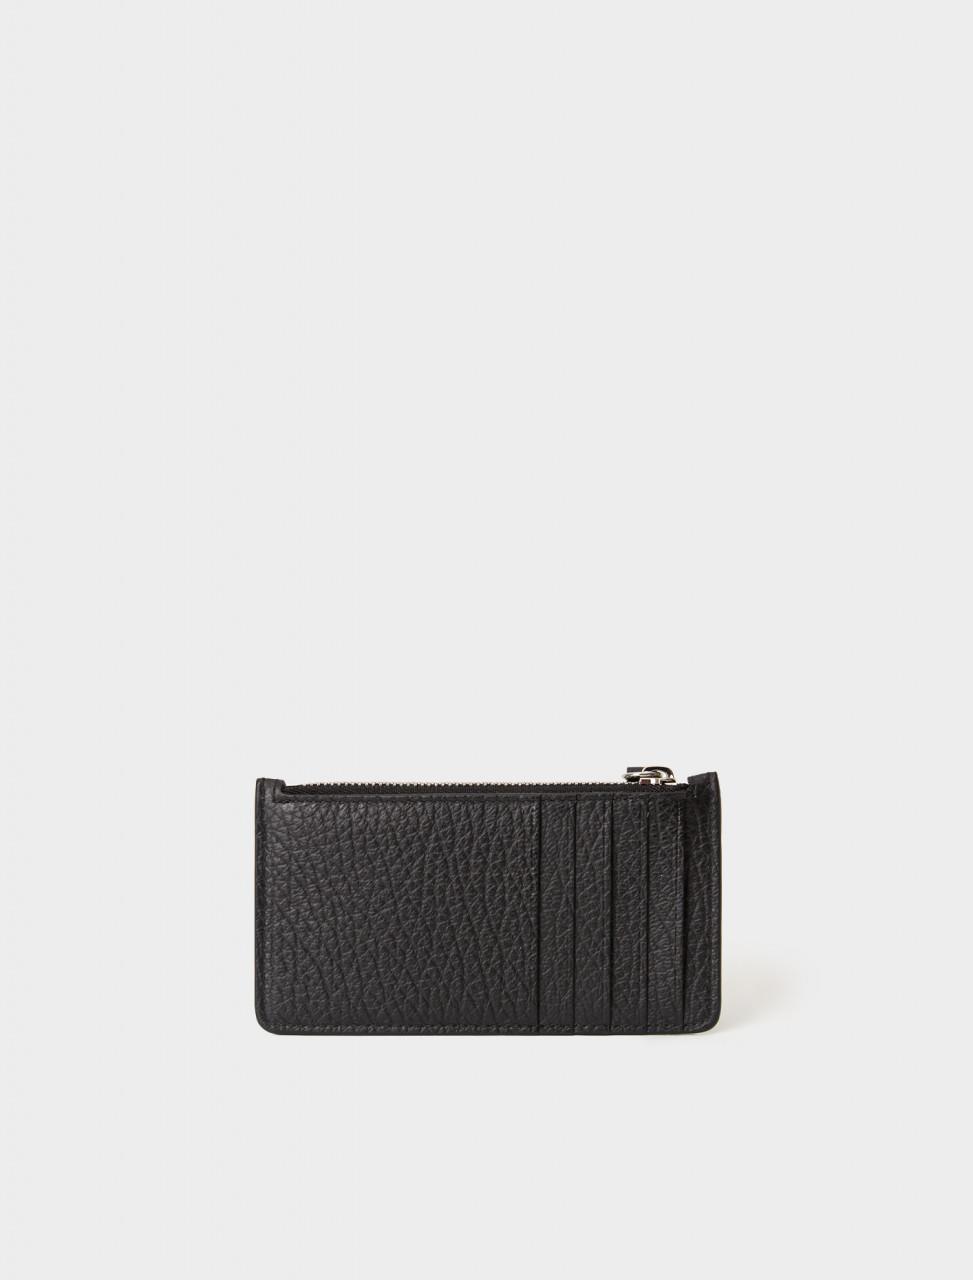 S56UI0143 MAISON MARGIELA CARD WALLET BLACK